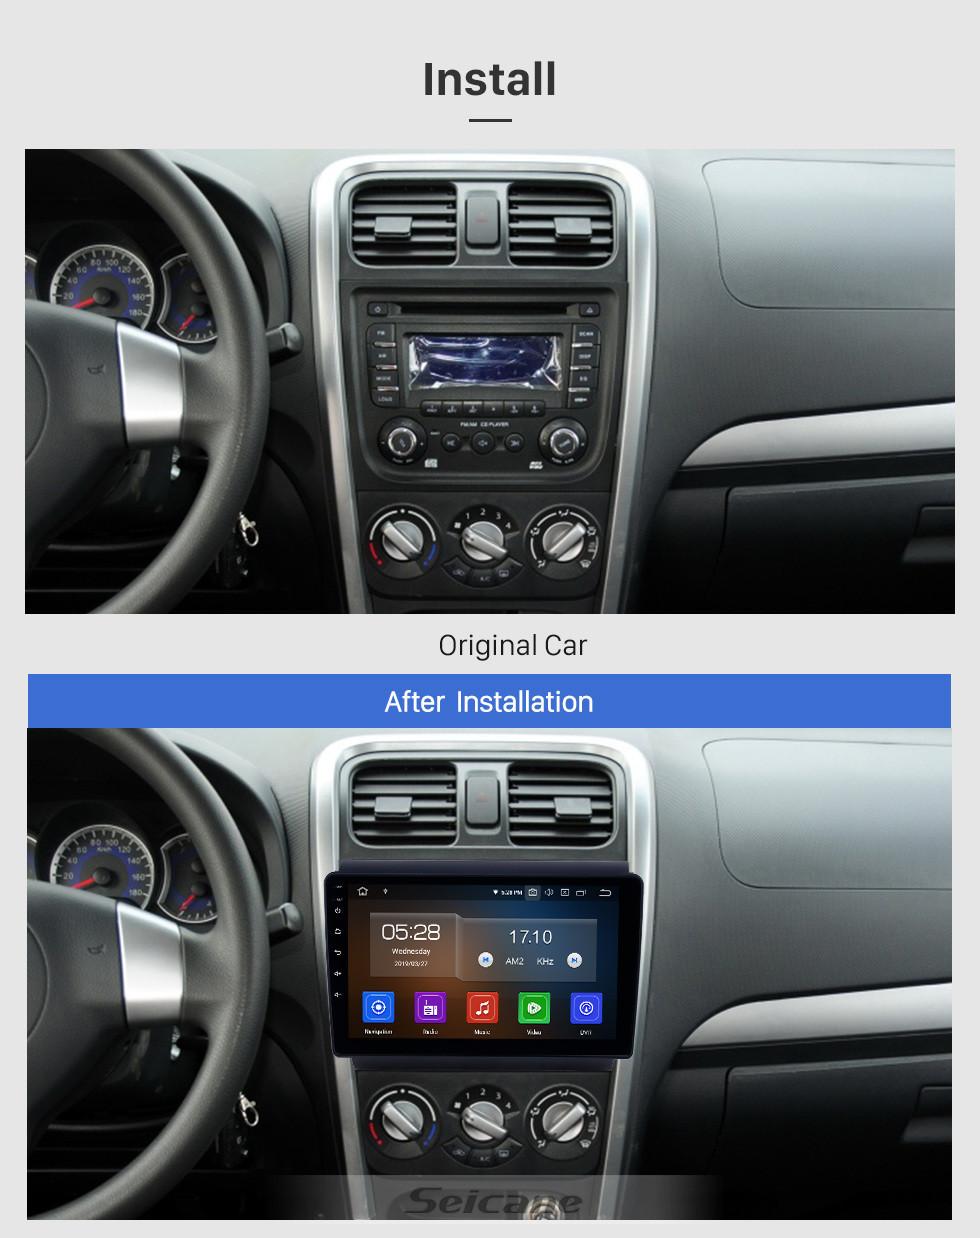 Seicane OEM 9 inch Android 10.0 for 2013-2017 Suzuki Wagon R X5 Bluetooth HD Touchscreen GPS Navigation Radio Carplay support TPMS